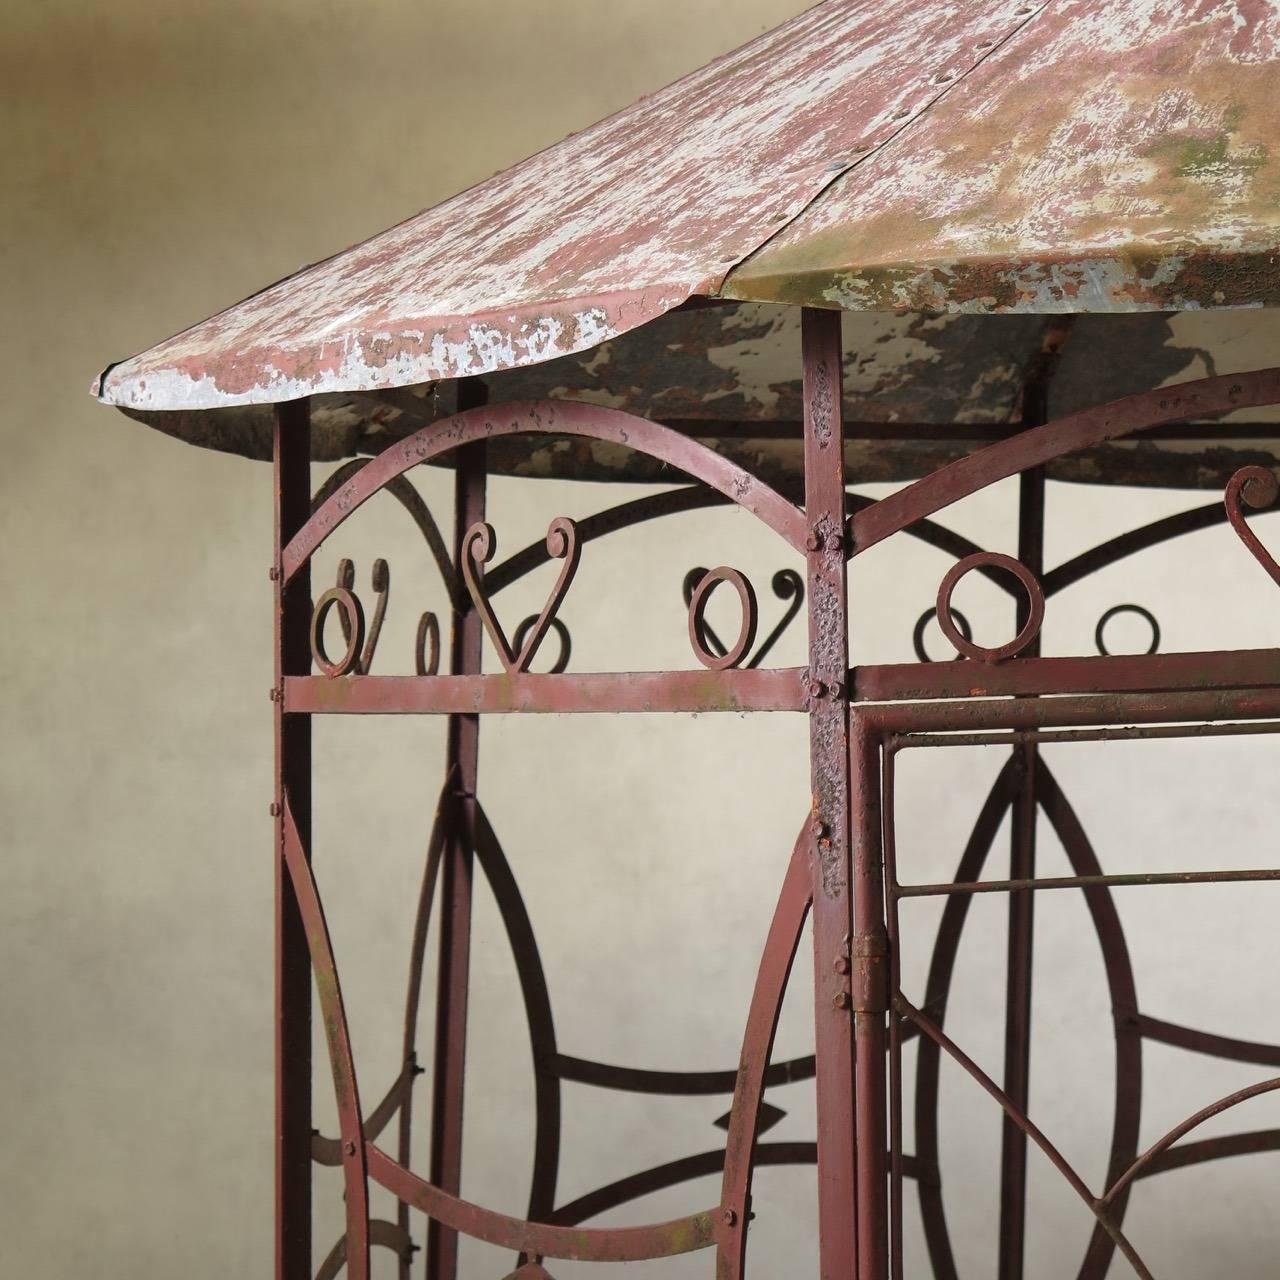 wrought iron art deco pergola france 1920s at 1stdibs. Black Bedroom Furniture Sets. Home Design Ideas